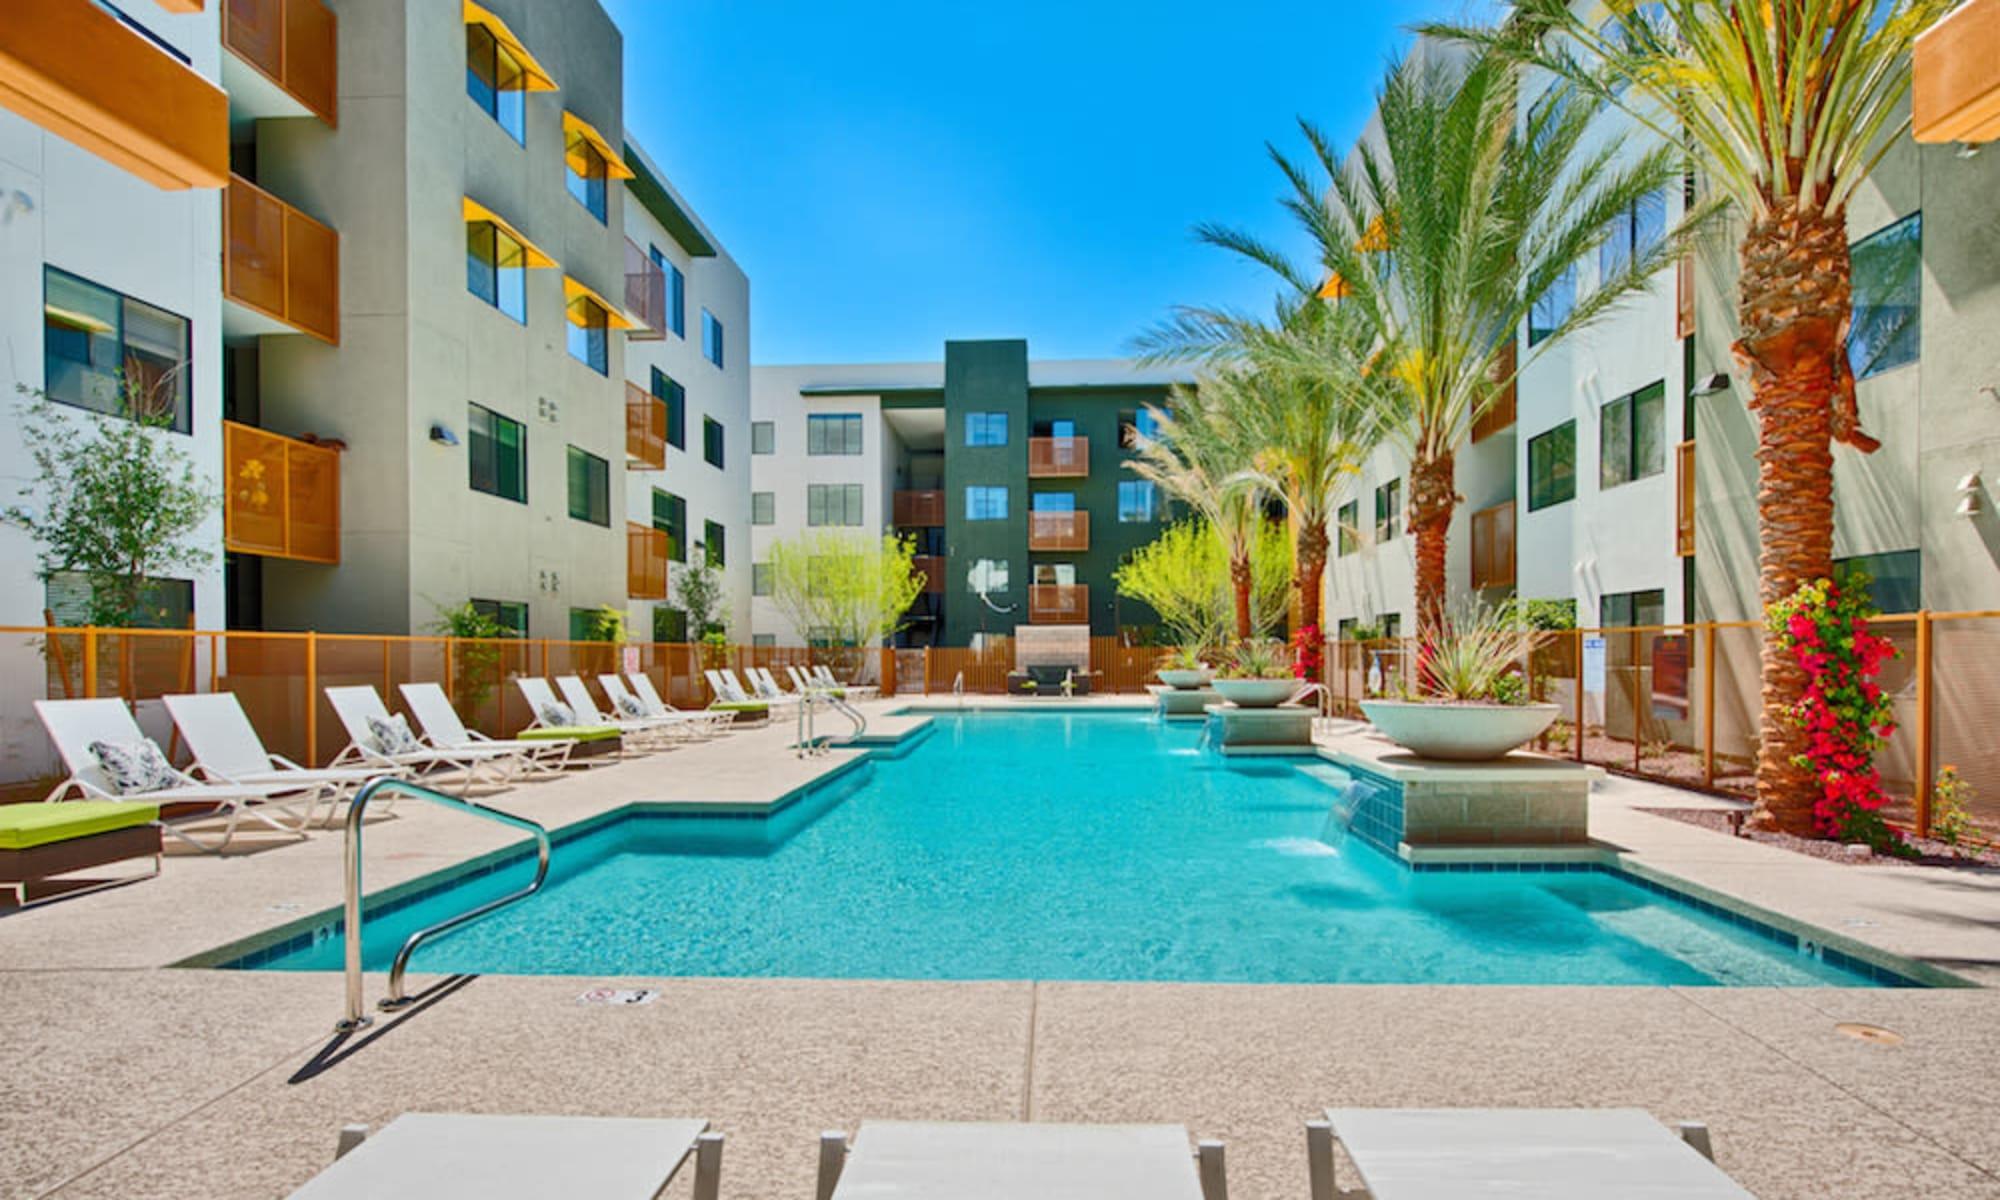 Apartments at Cactus Forty-2 in Phoenix, Arizona